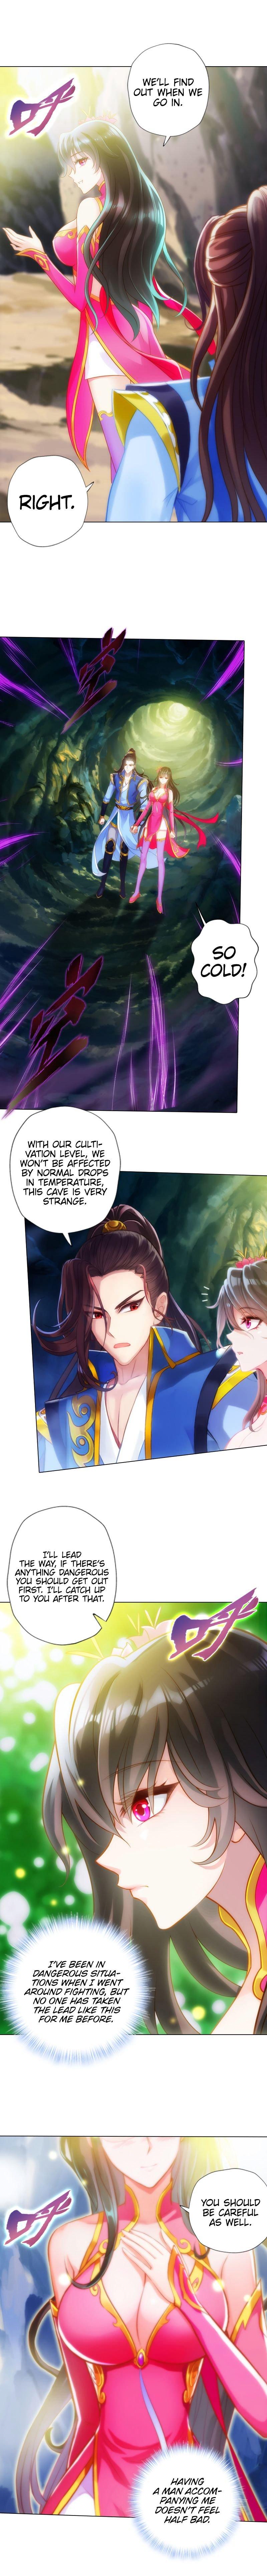 Manga Lang Huan Library - Chapter 74 Page 5